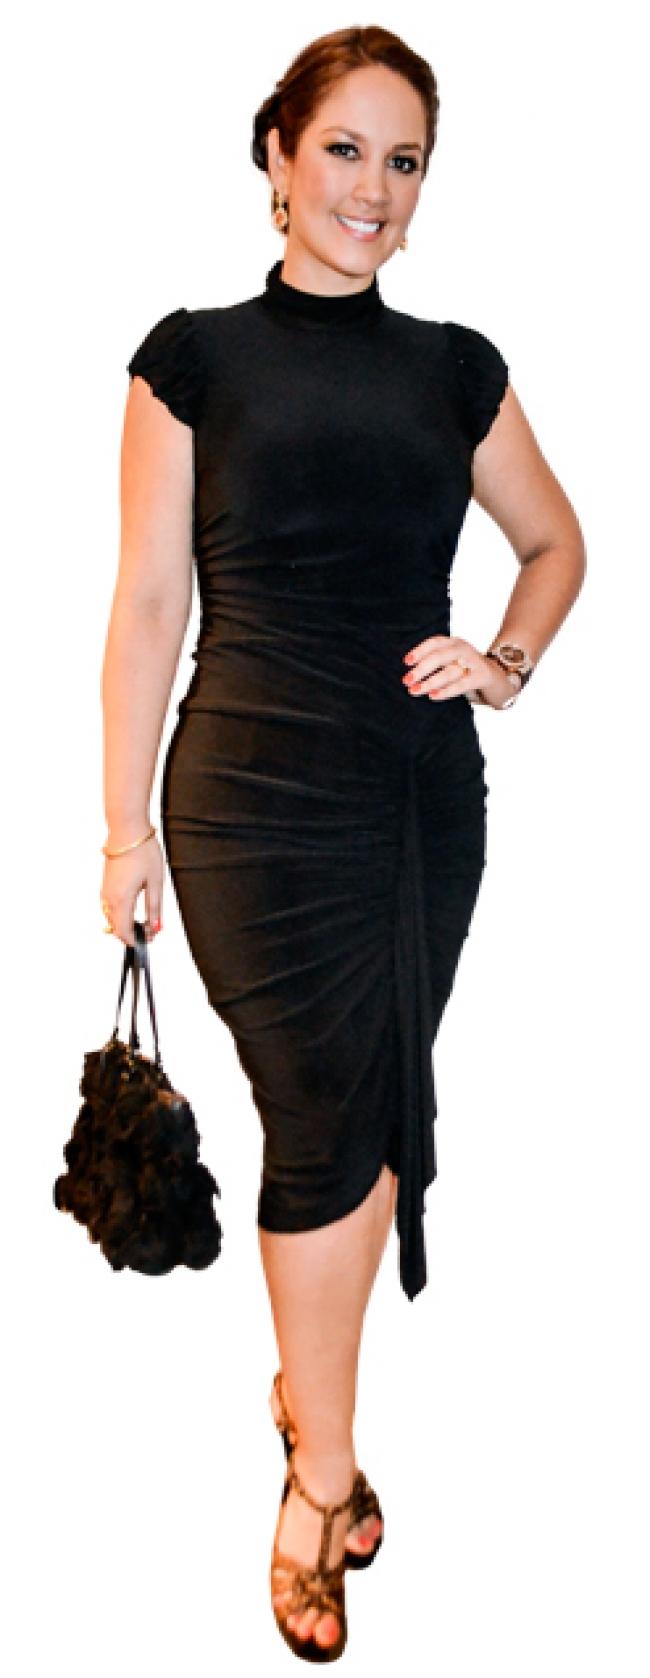 marina mora, miss mundo peru 2002 (top 3 de miss world 2002). 5xomac5b